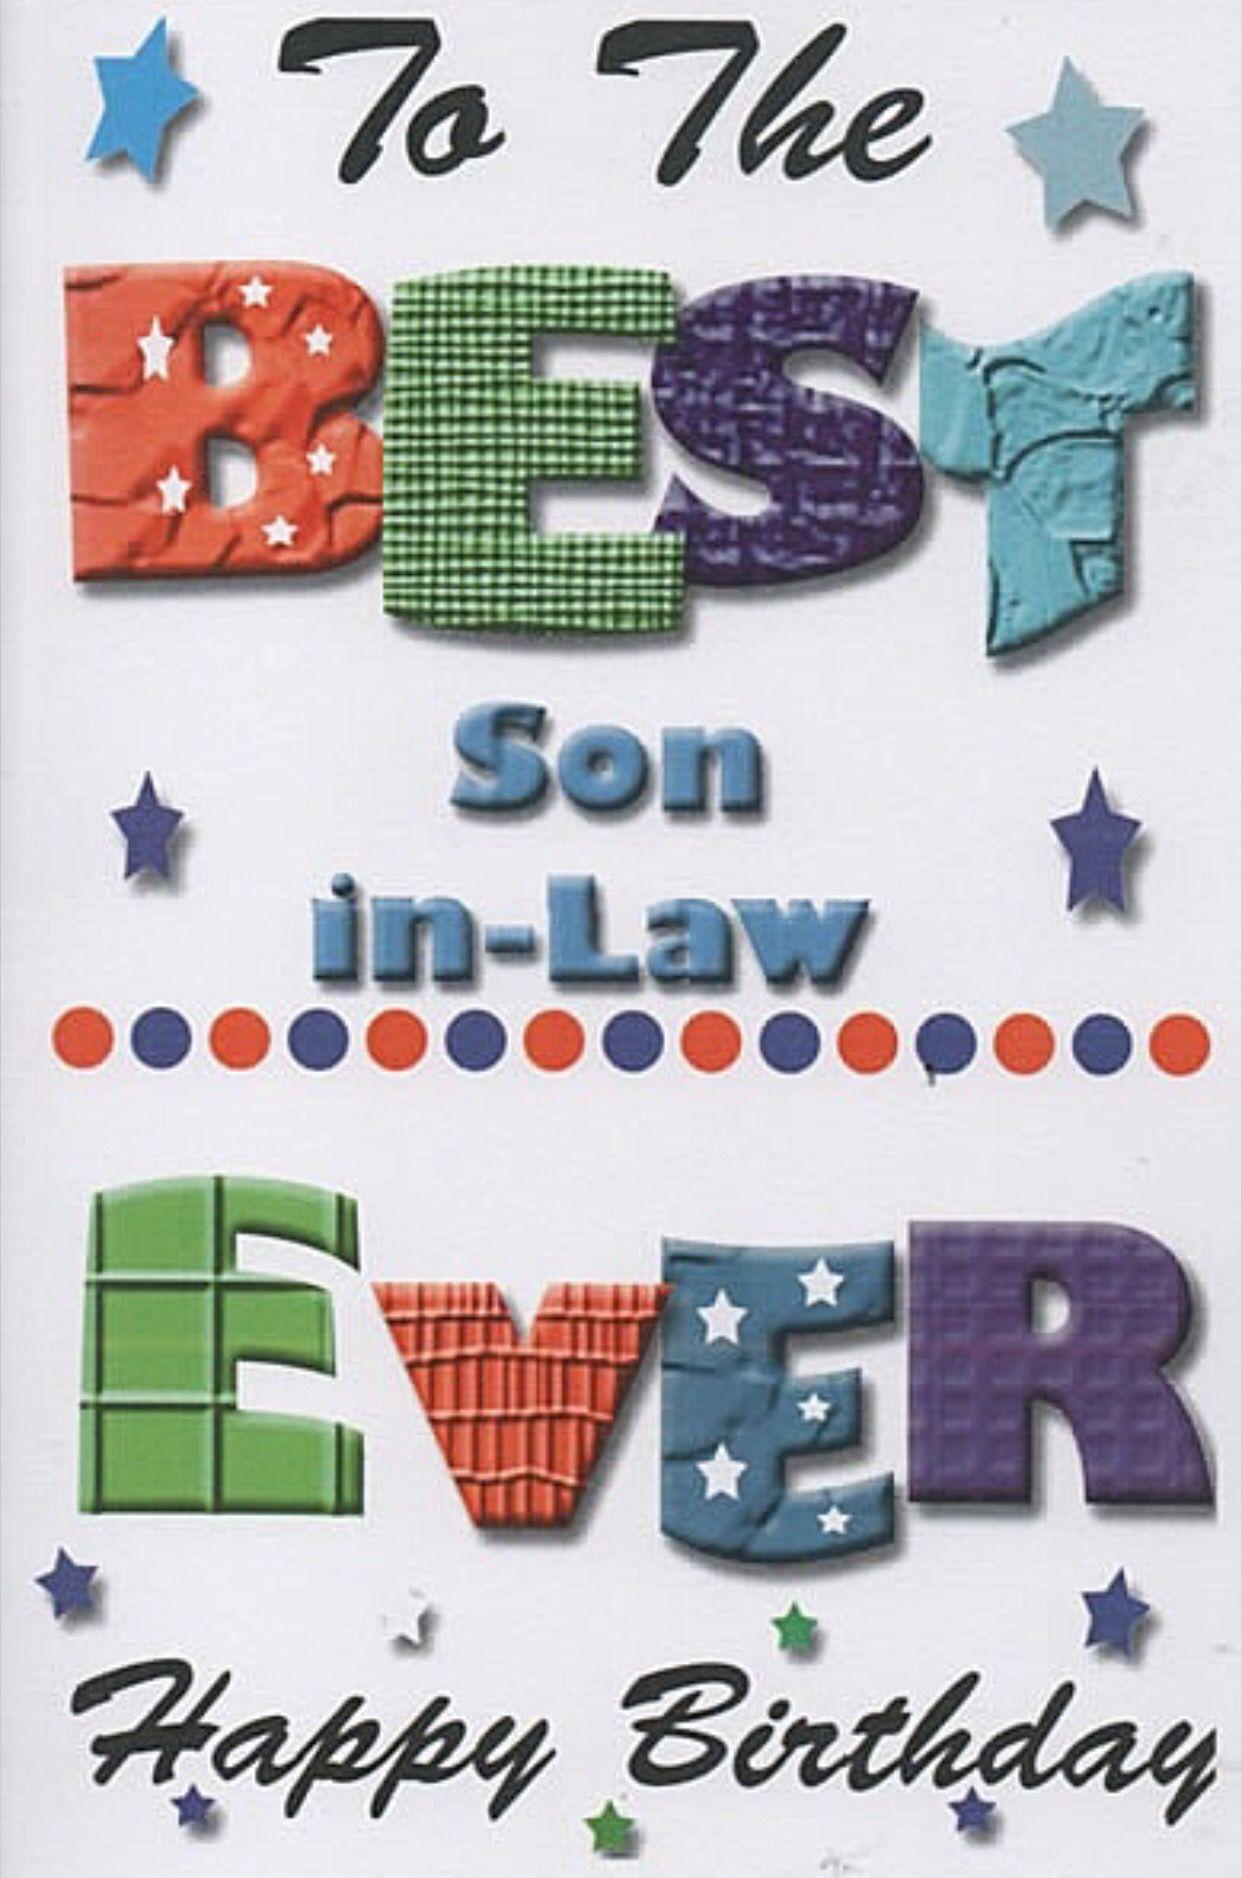 Happy Birthday Son In Law Free Card Husband